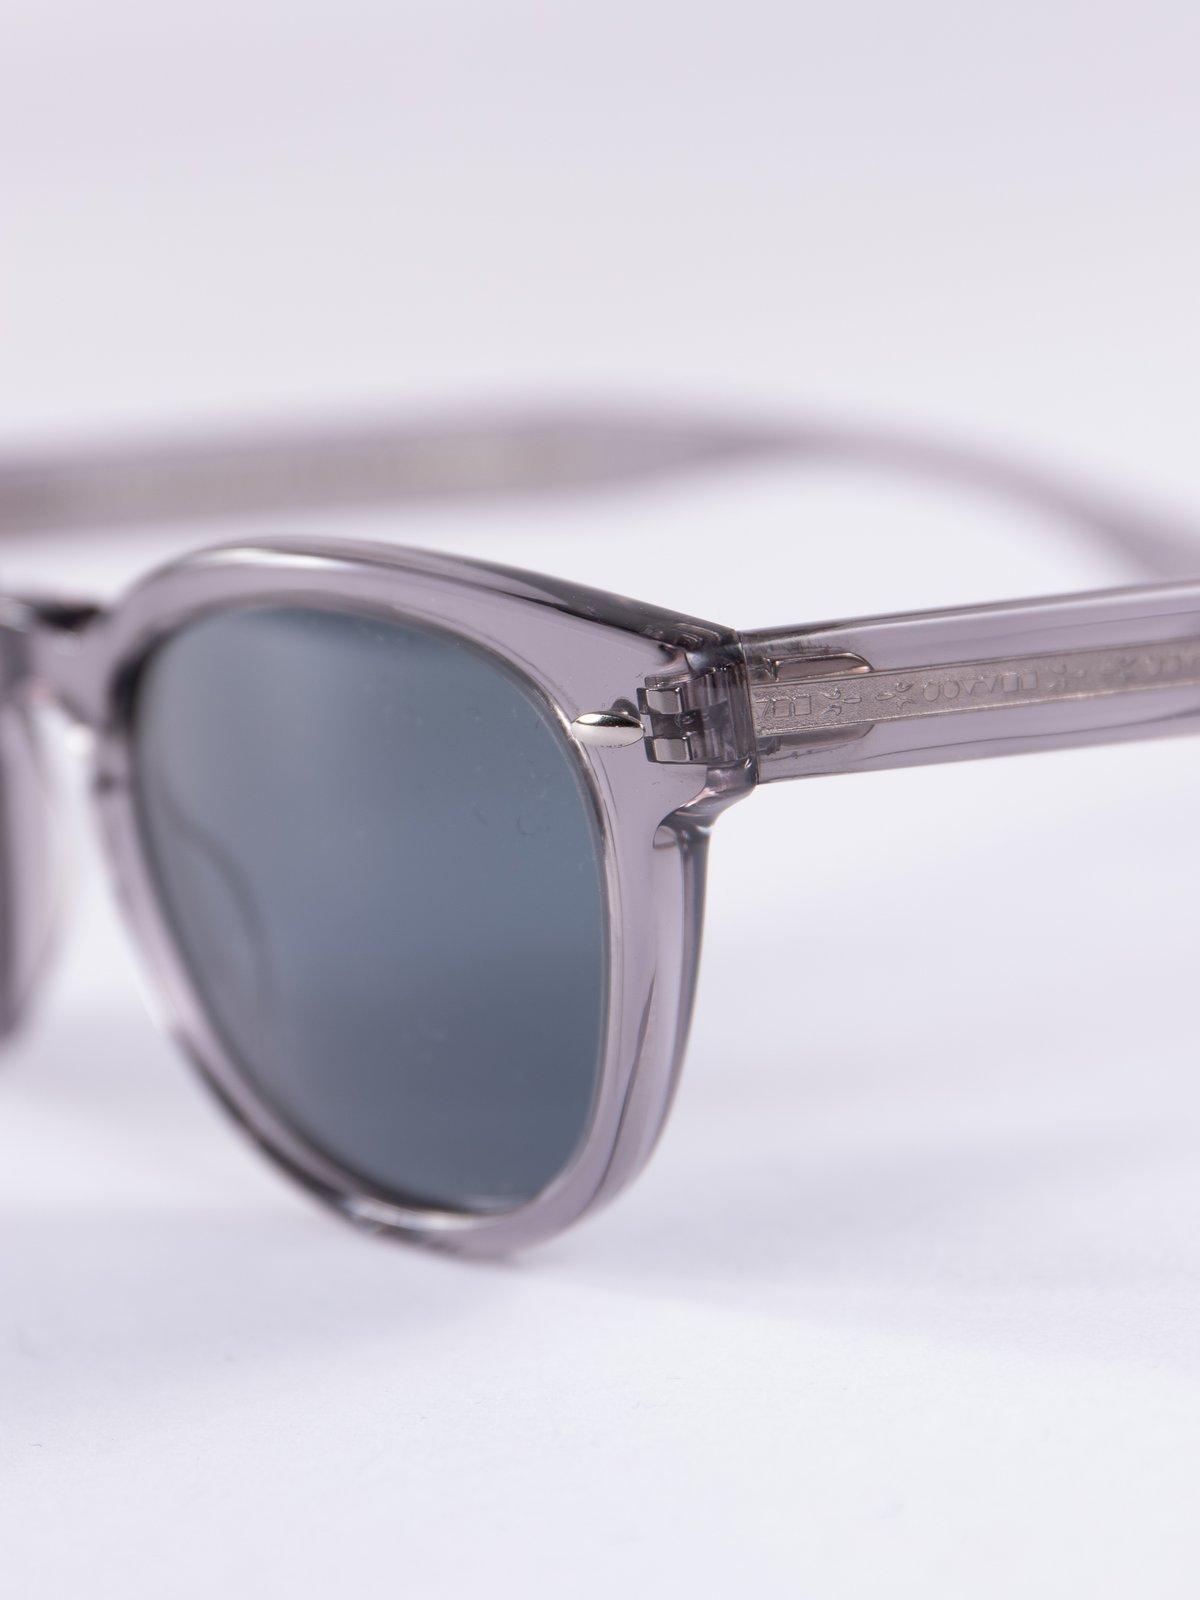 Workman Grey Sheldrake Sunglasses - Image 4